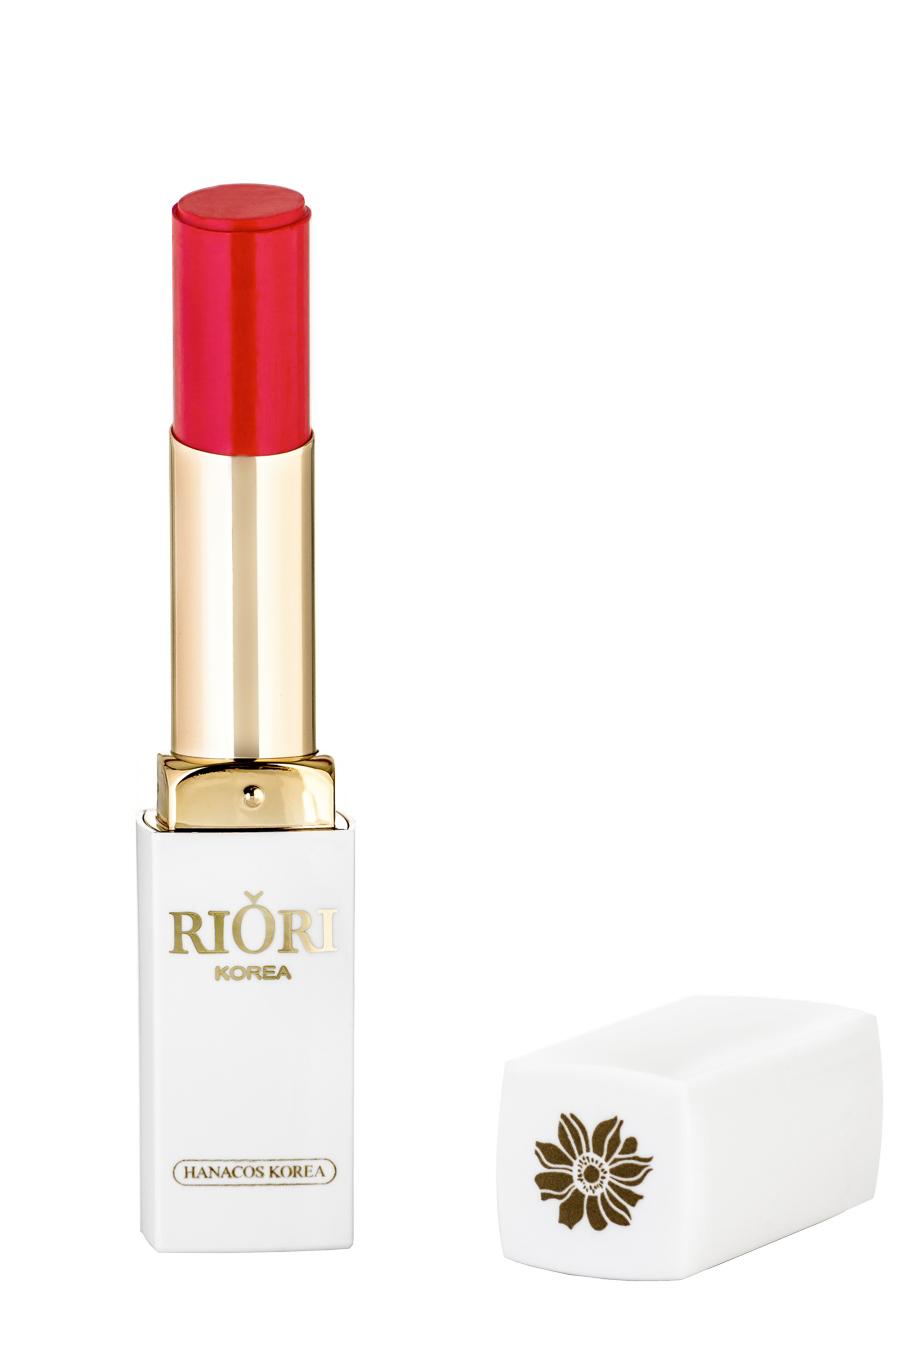 son-moi-riori-lipstick-1.jpg